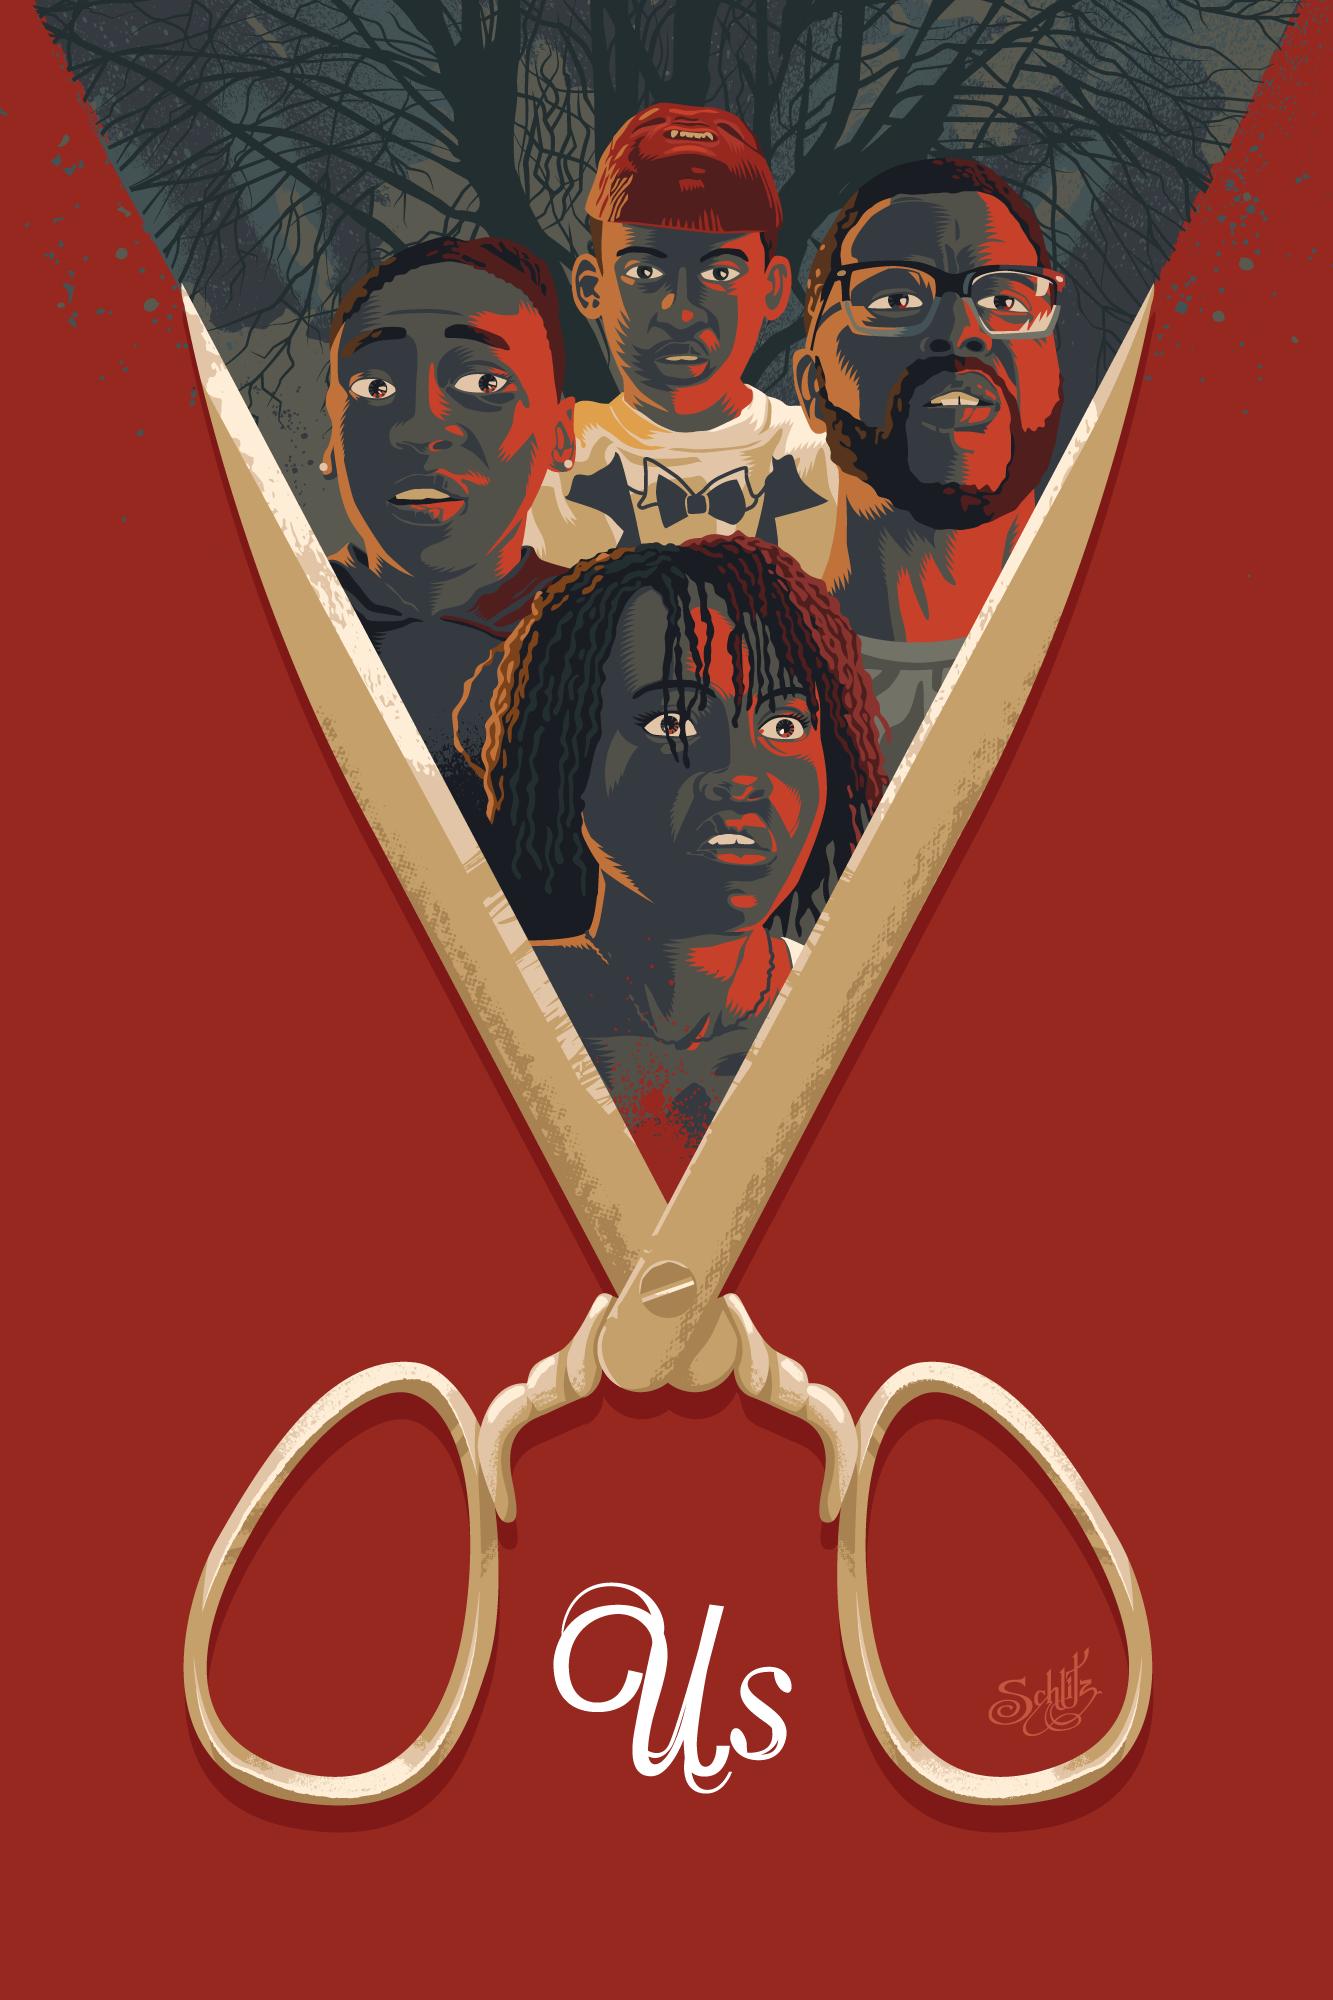 Us Movie Usmovie Jordan Peele Poster Art Posters Movies Horror Thriller Movie Poster Art Film Posters Art Horror Movie Art